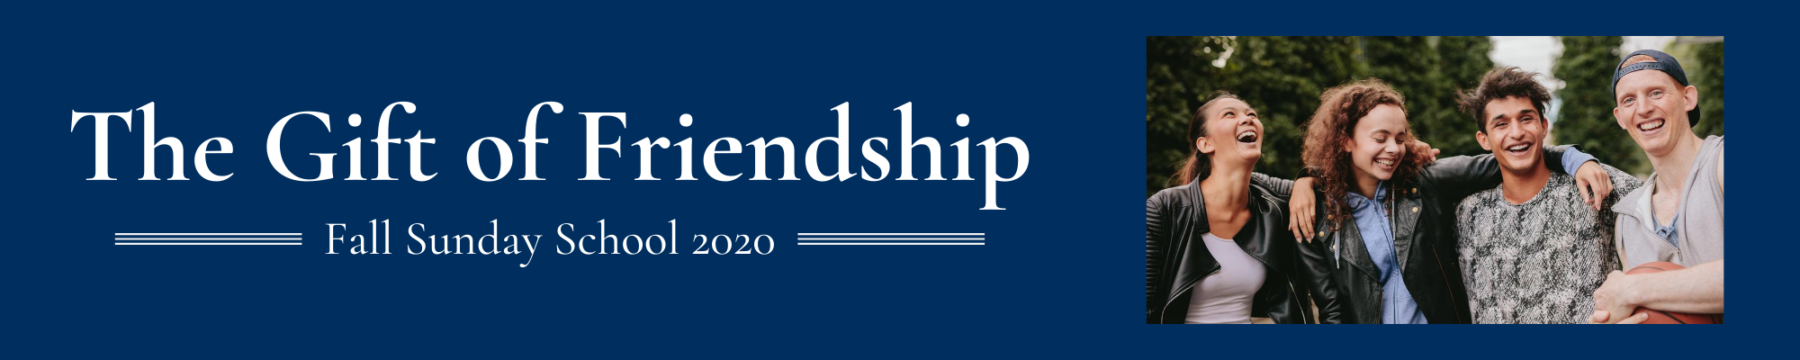 2020-0825 banner